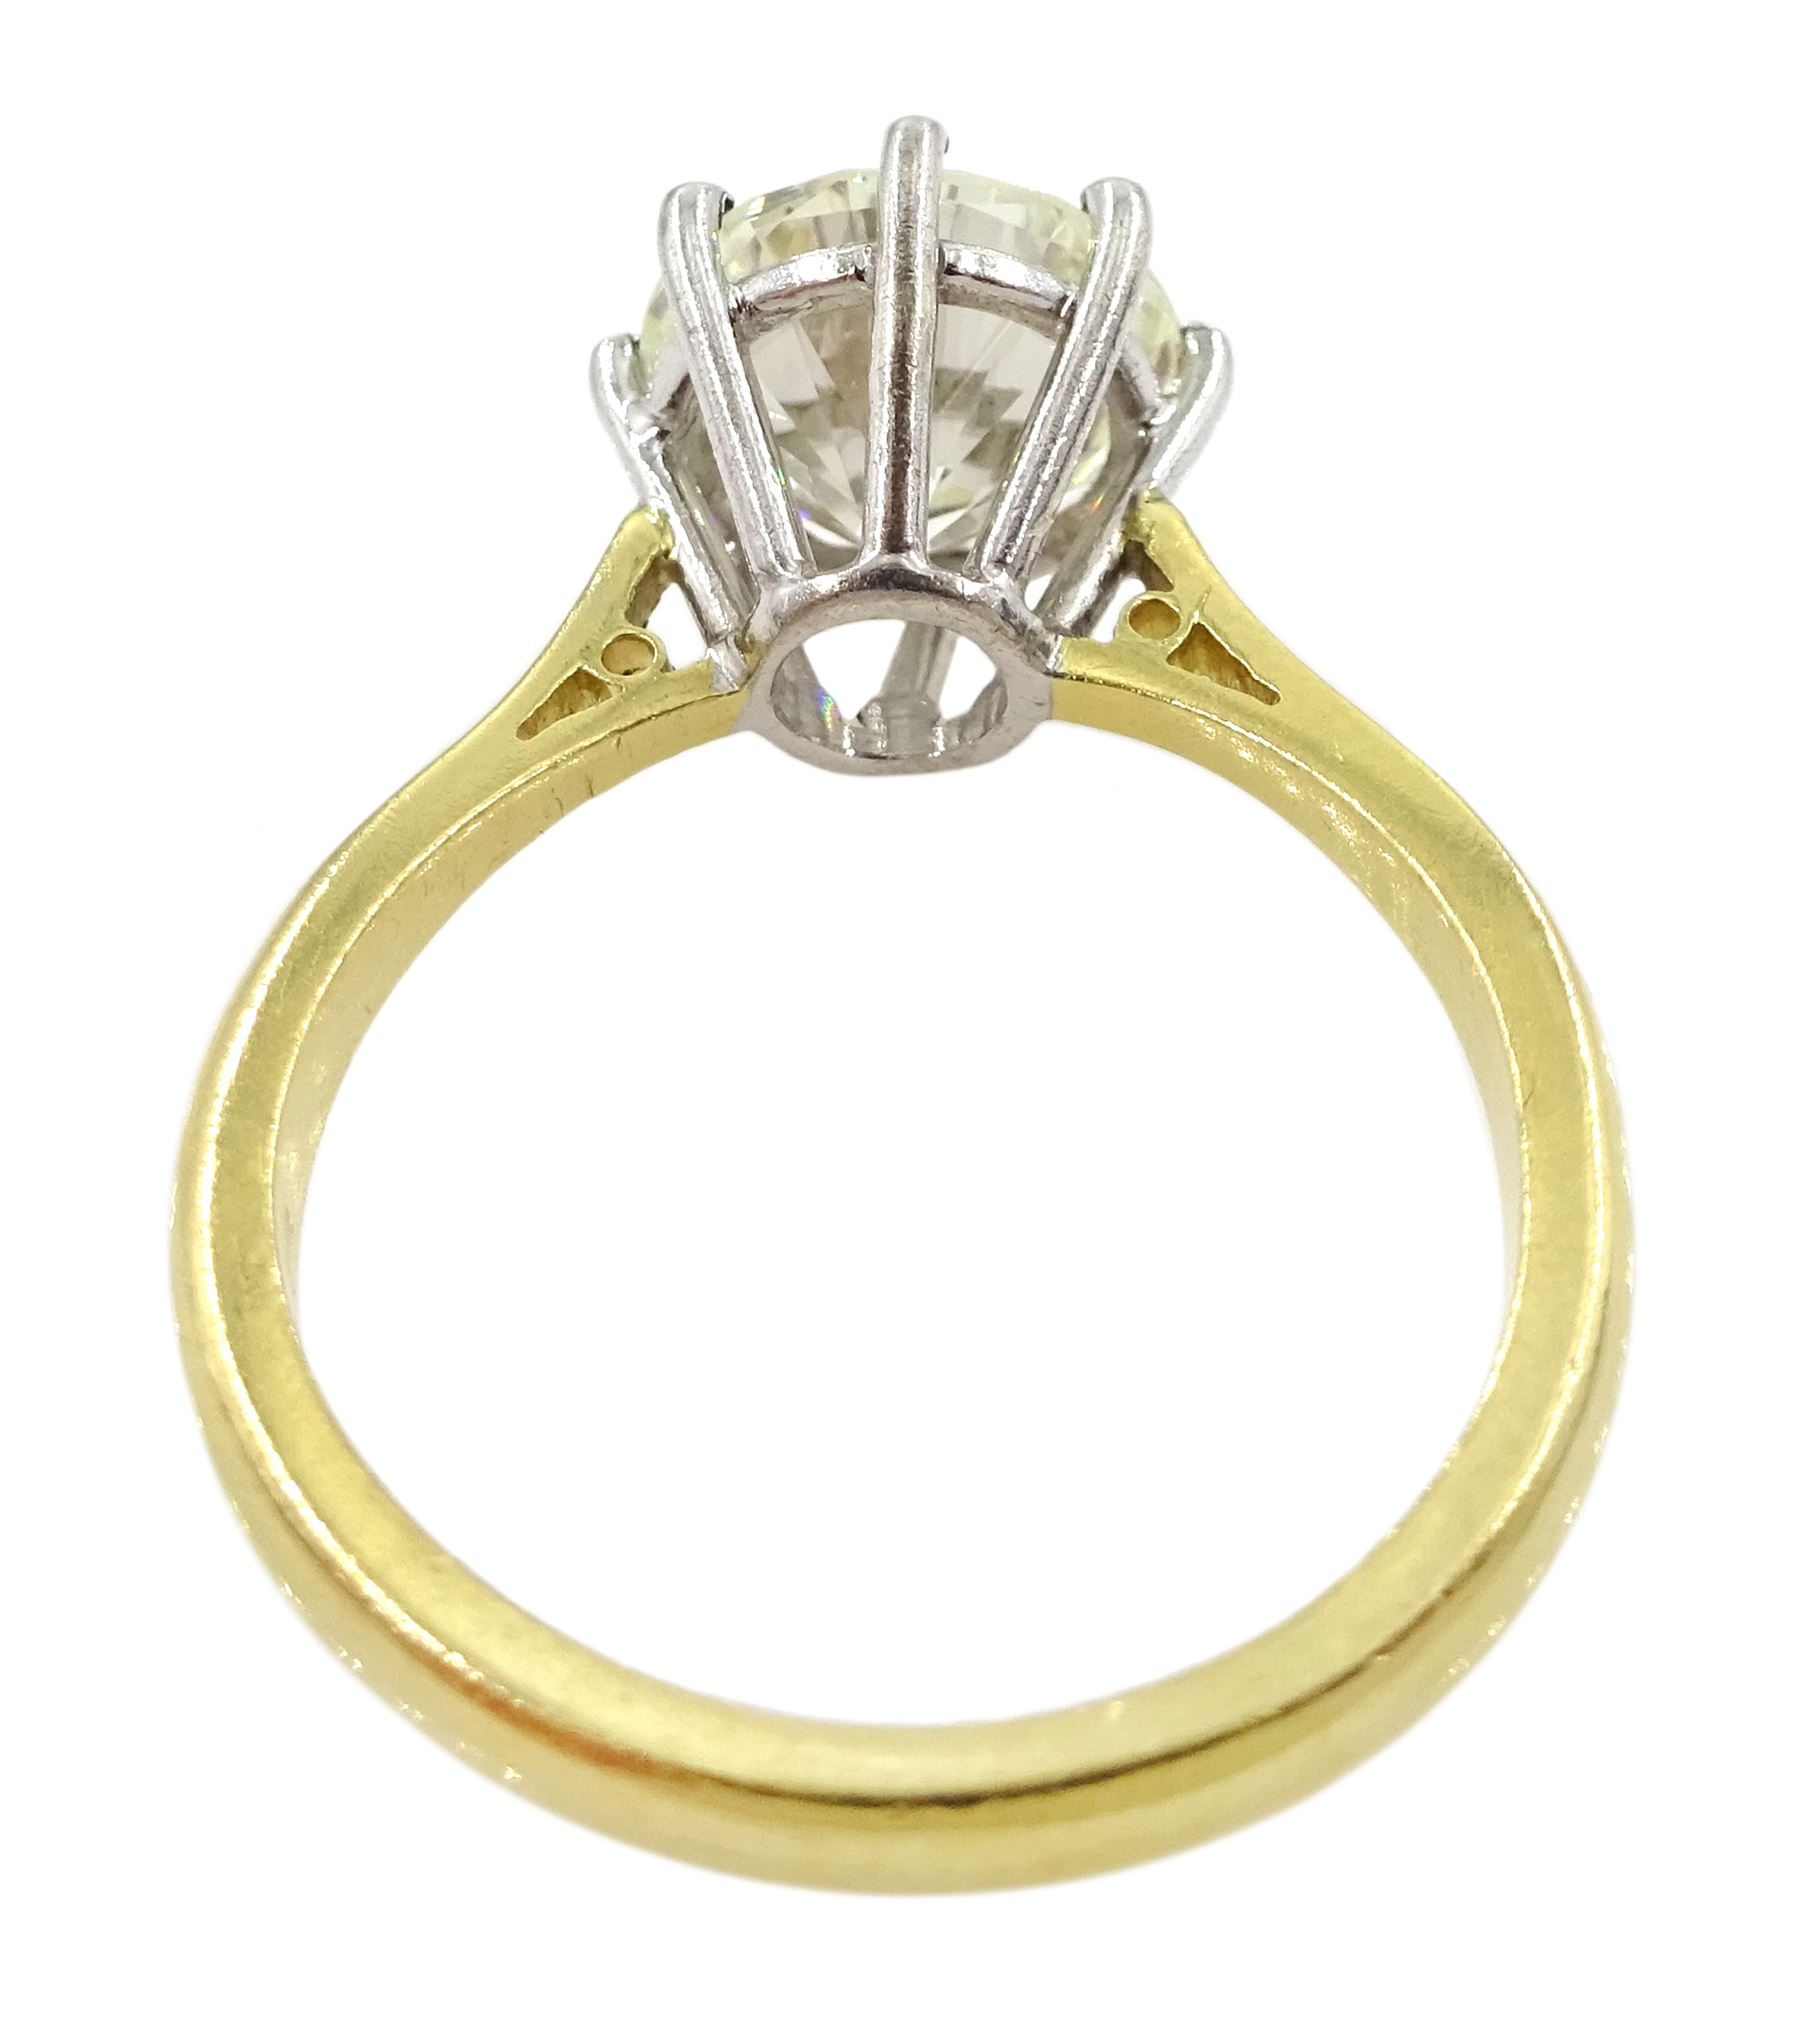 18ct gold round brilliant cut diamond ring - Image 4 of 7